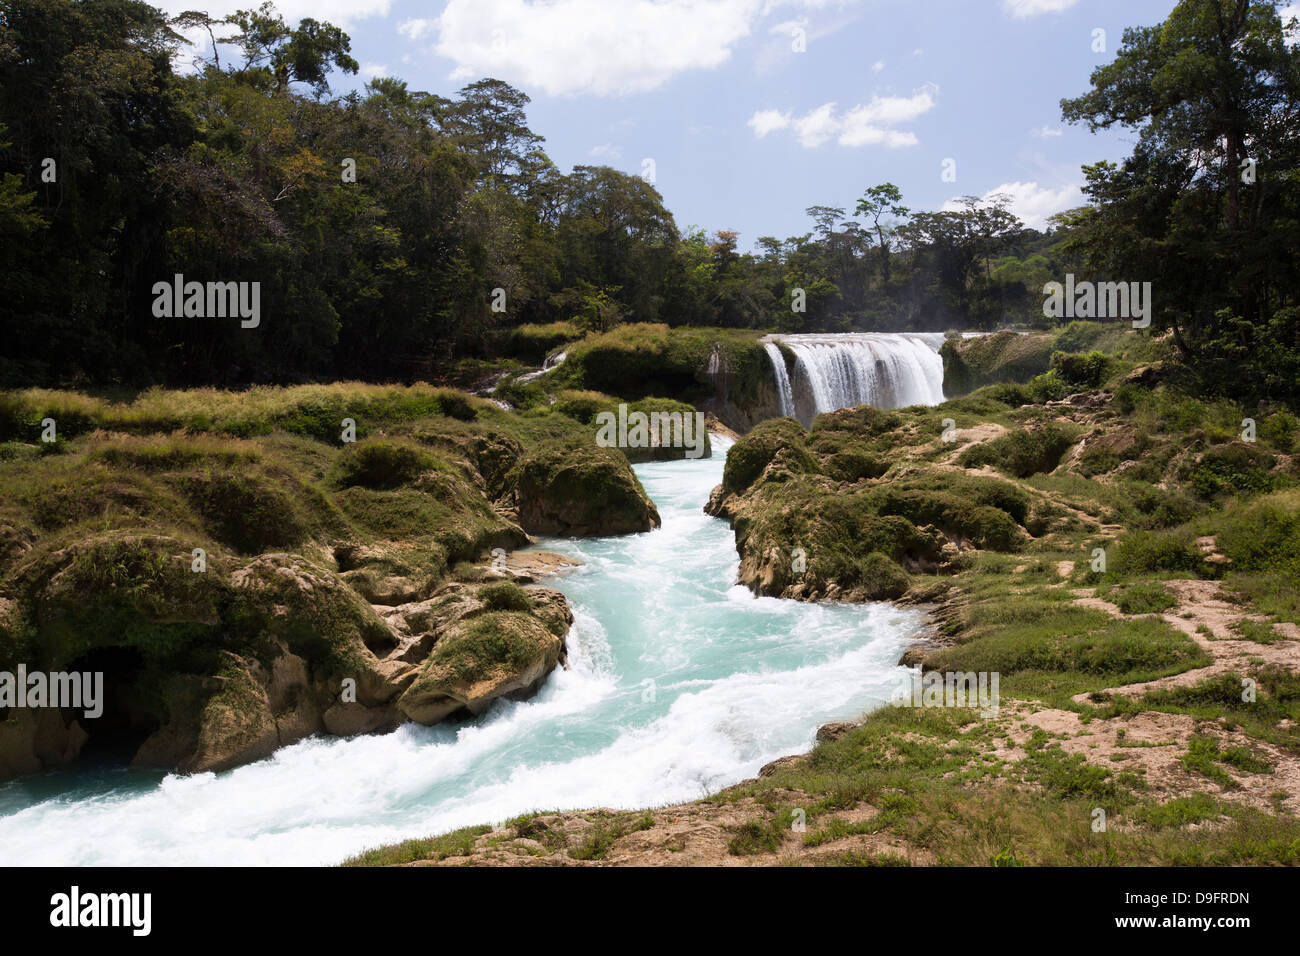 Rio Santo Domingo, Centro Ecoturistico Las Nubes, Chiapas, Mexico - Stock Image